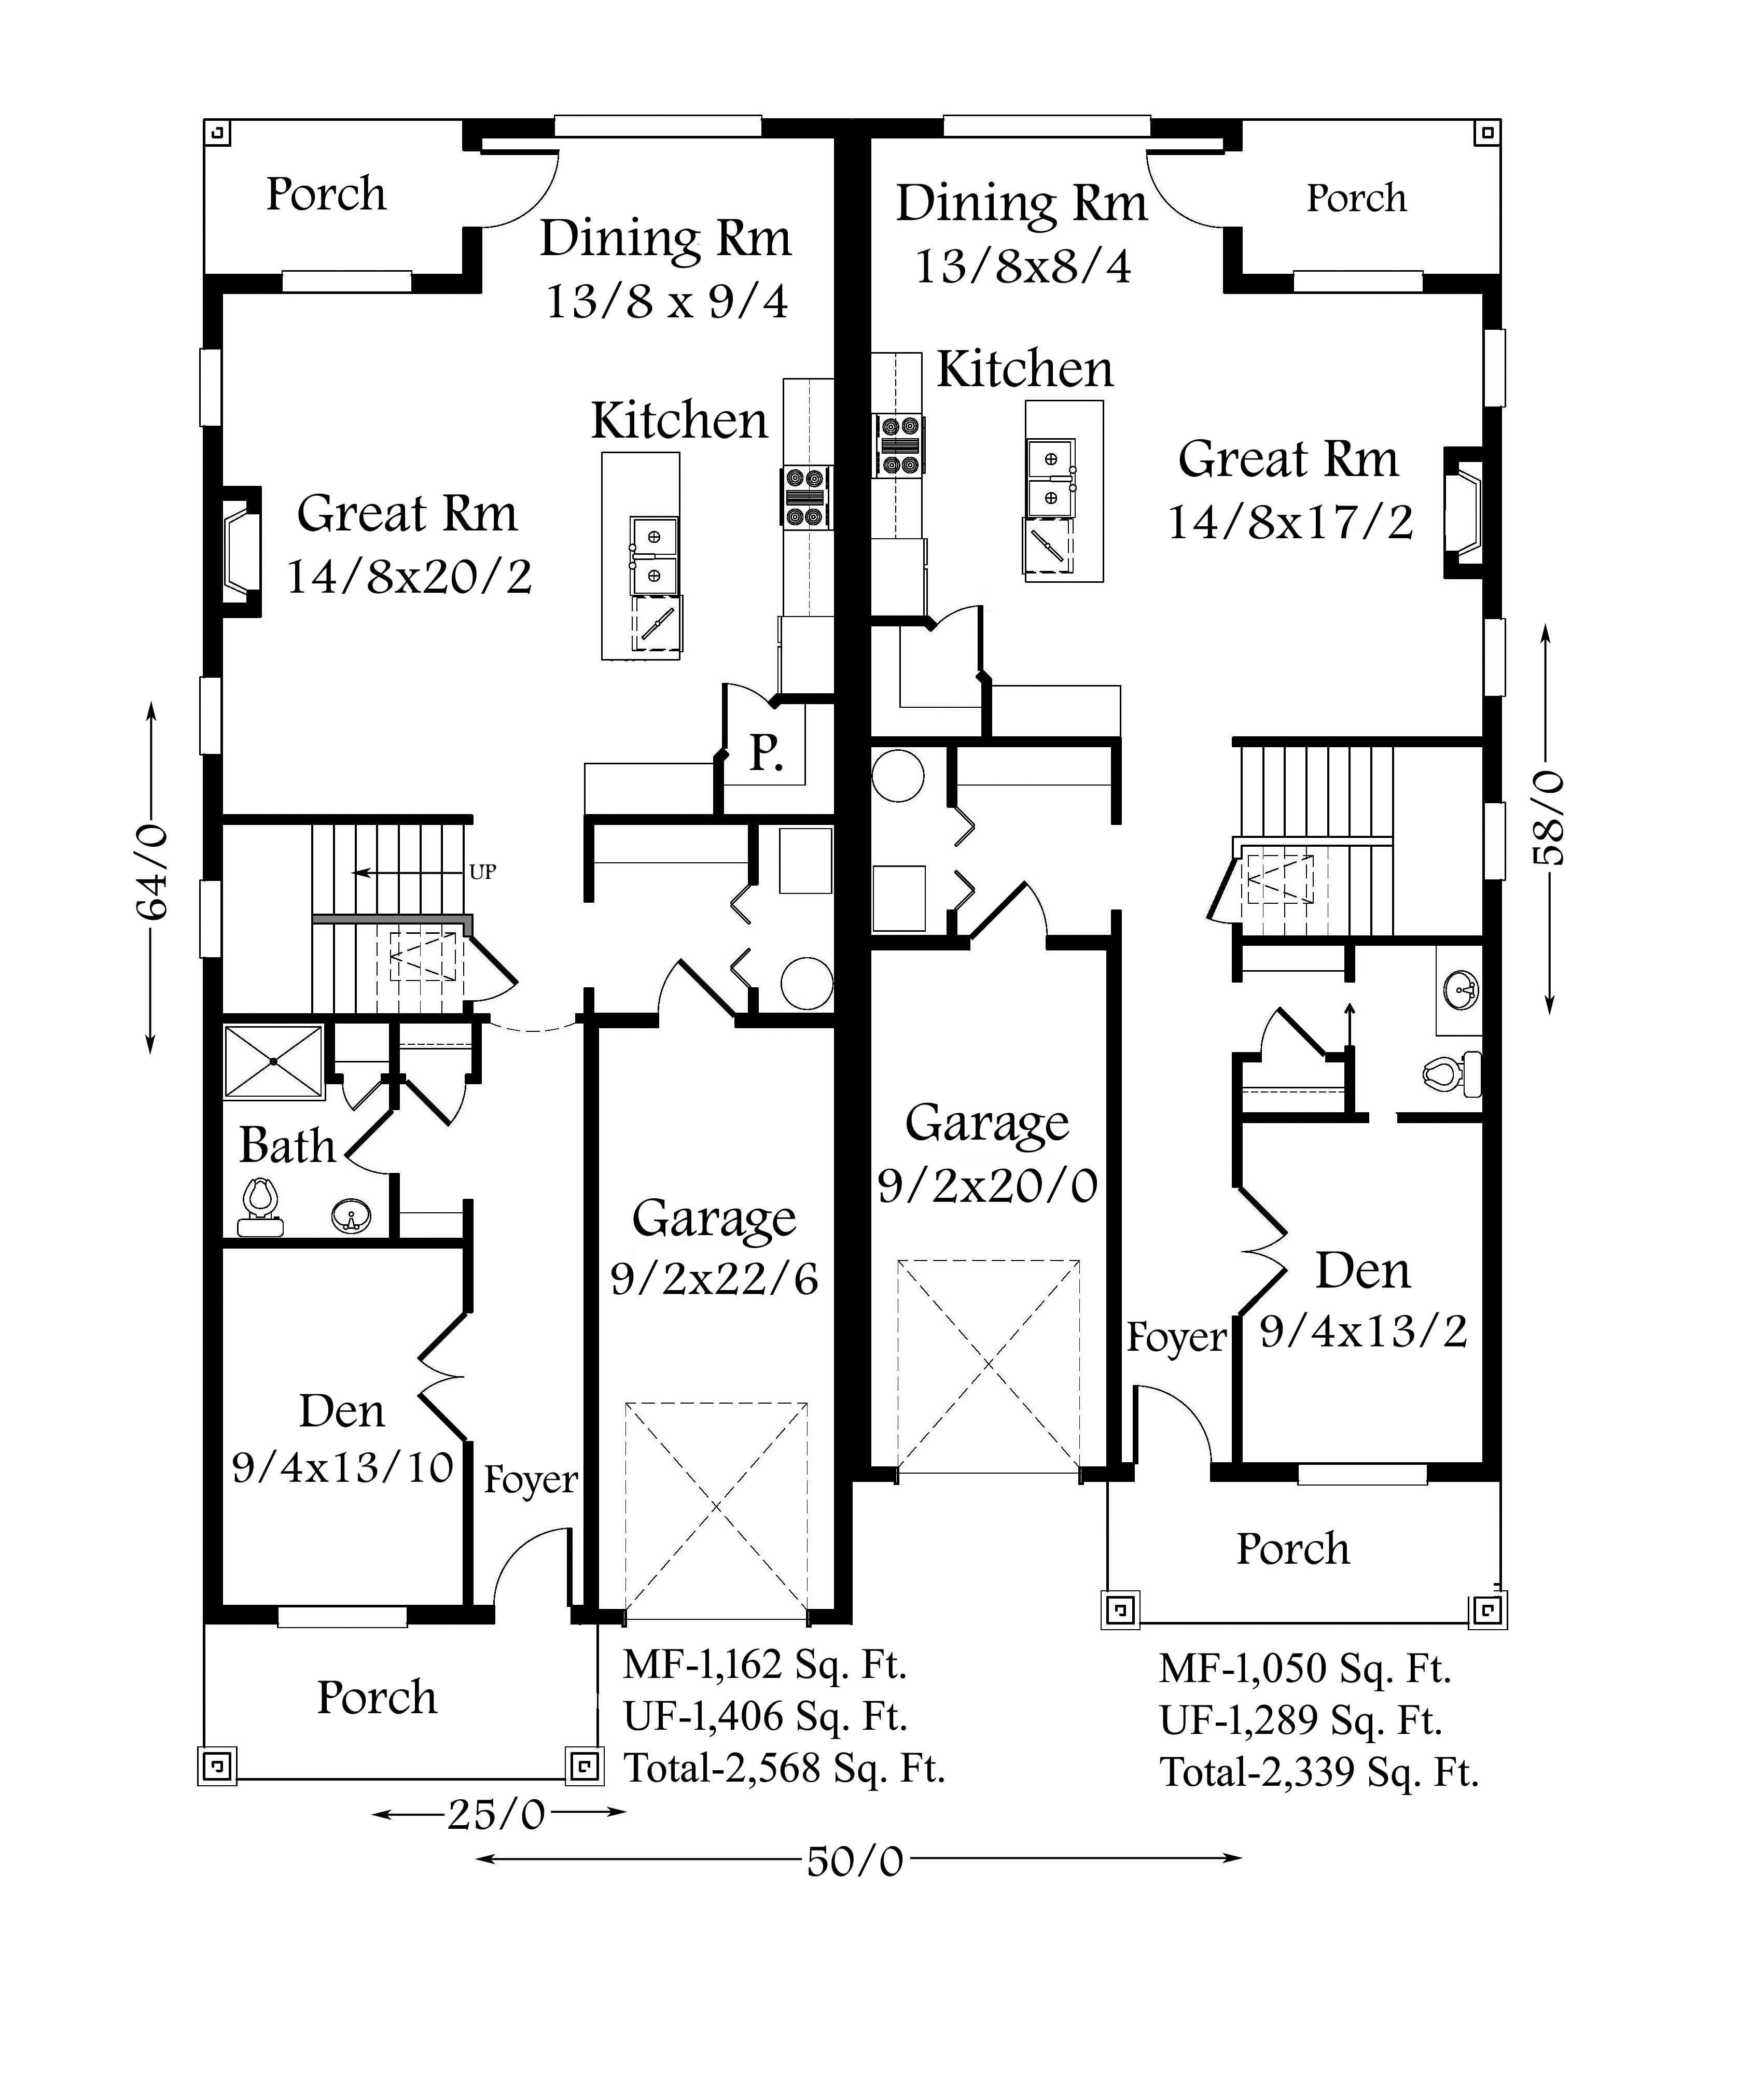 Glenview 1 2 House Plan Skinny Duplex House Plan By Mark Stewart In 2020 Duplex House Plans Duplex Plans Duplex Floor Plans